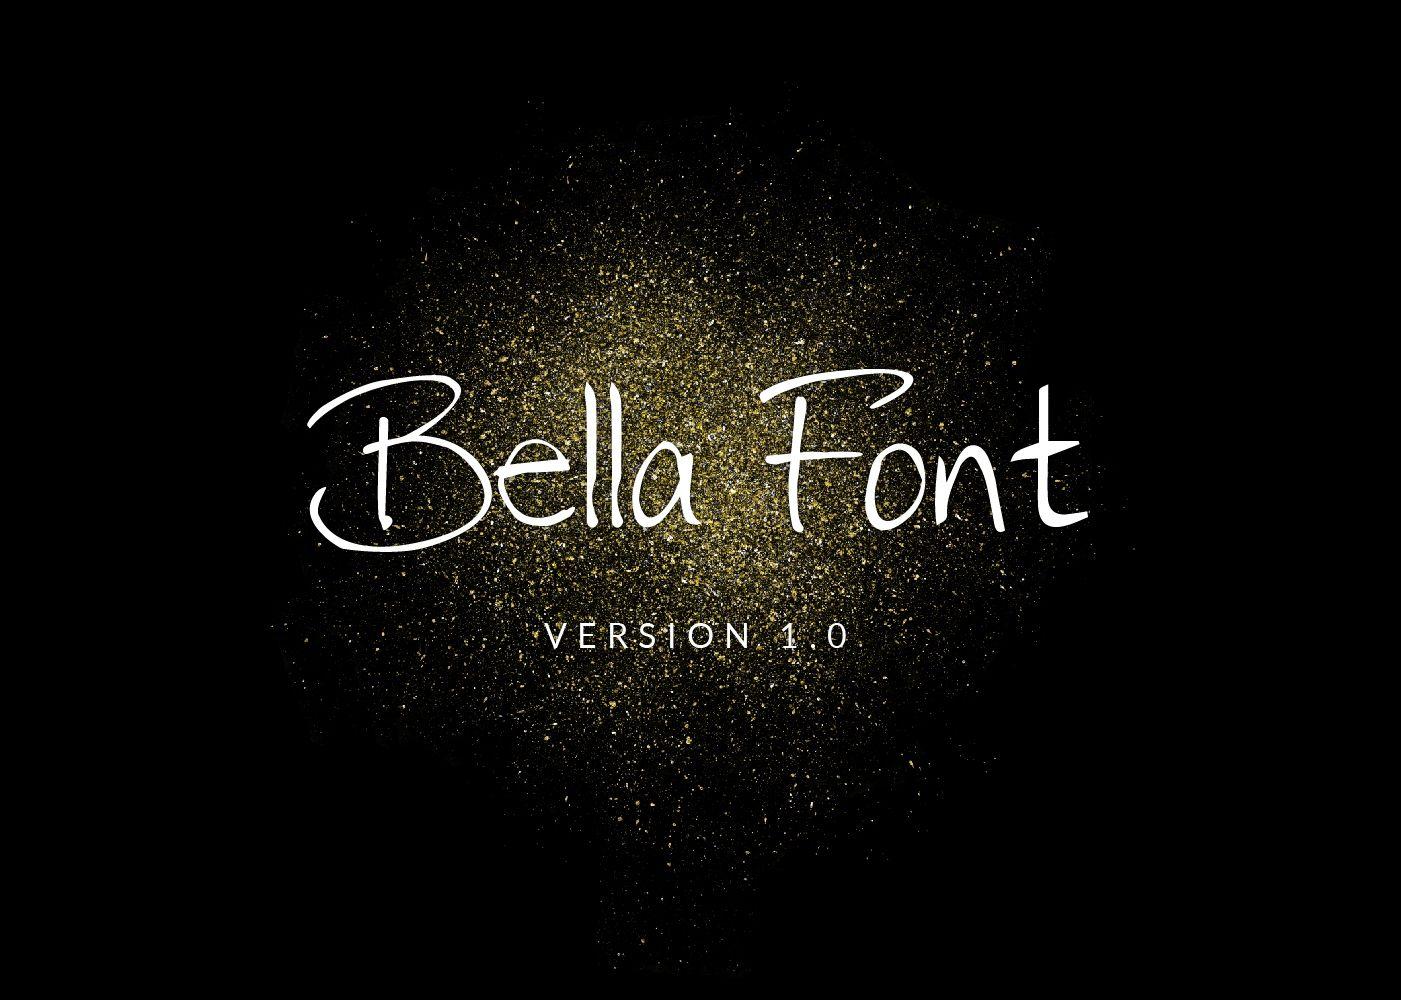 A script font fit for a queen. Version 1.0